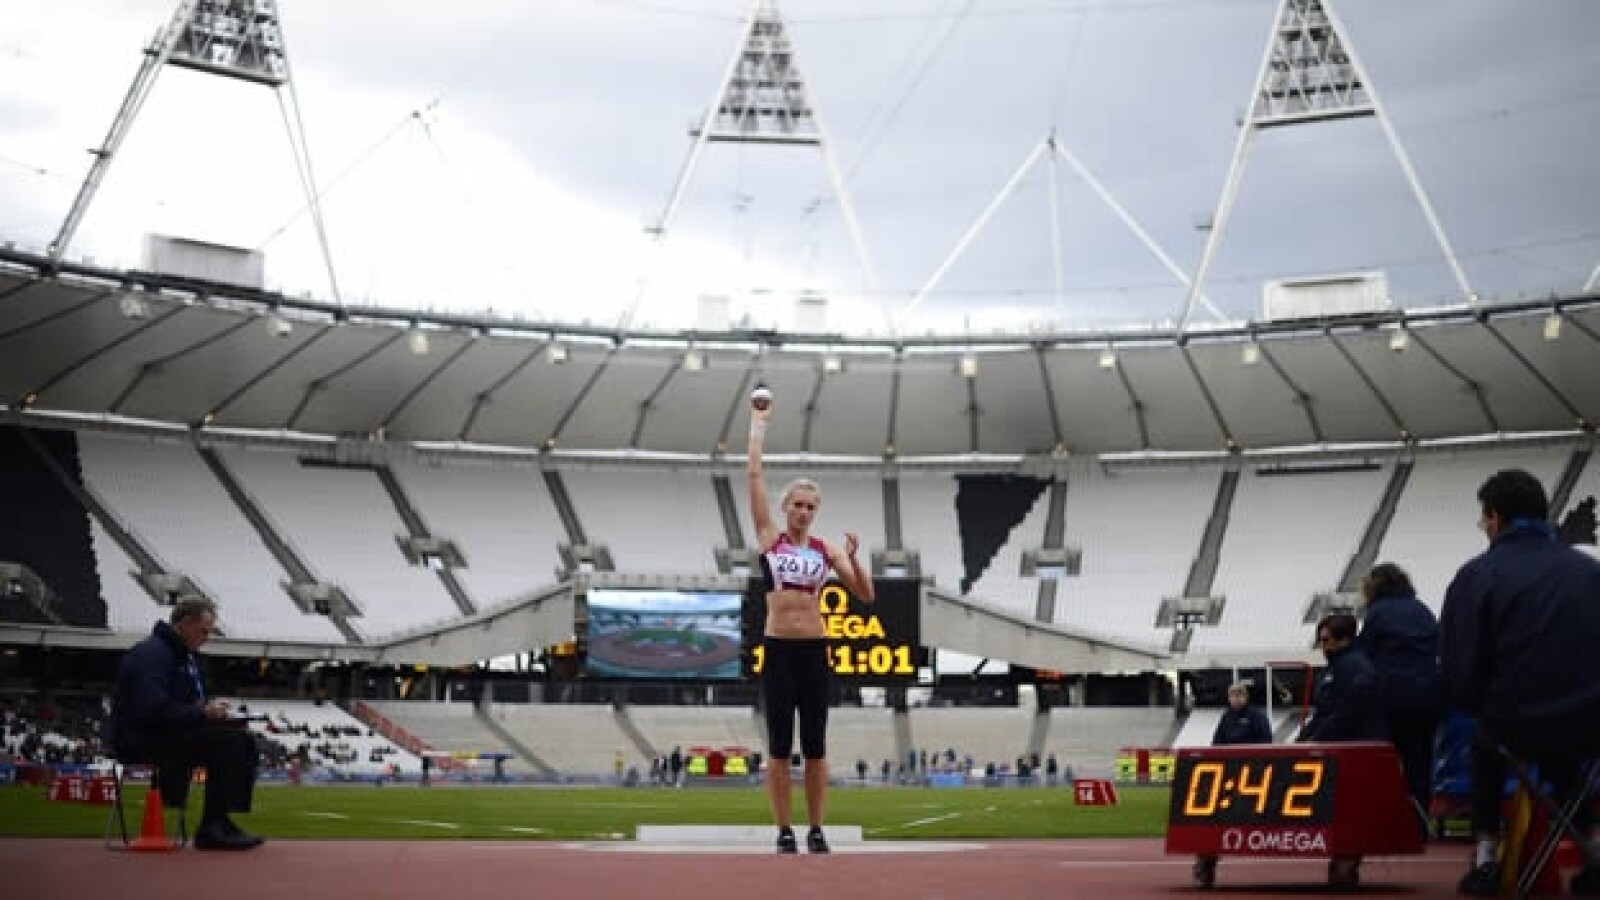 Estadio Olímpico apertura 3